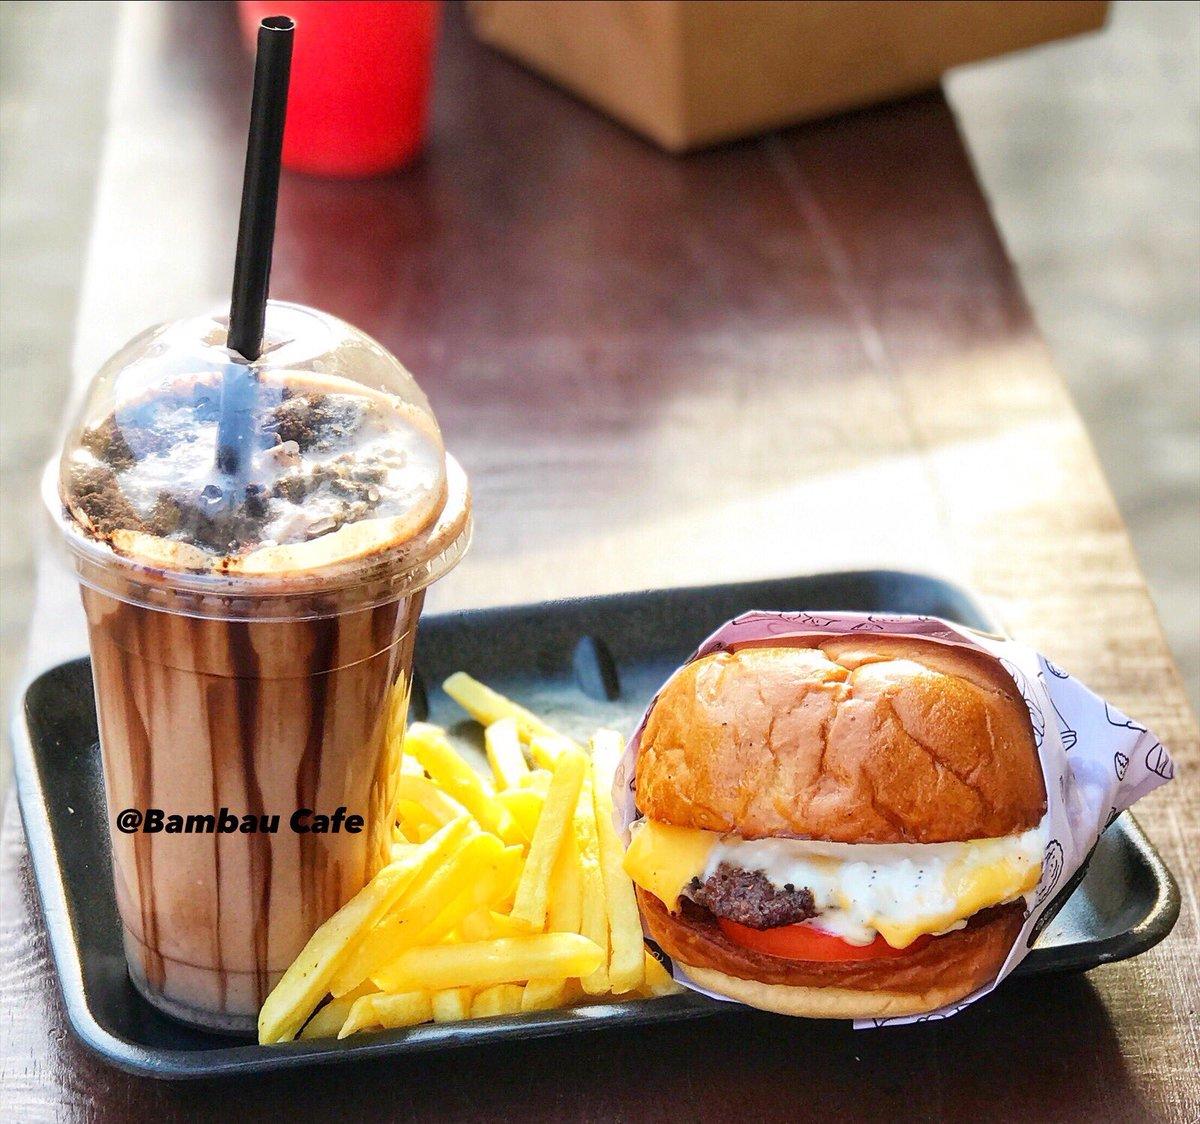 Burger fries and milkshake   You asked for it and we listened 😉  #bambau #BussItChallenge #frankiefx #thursdayvibes #thursdaymorning #COVID19 #BernieSanders